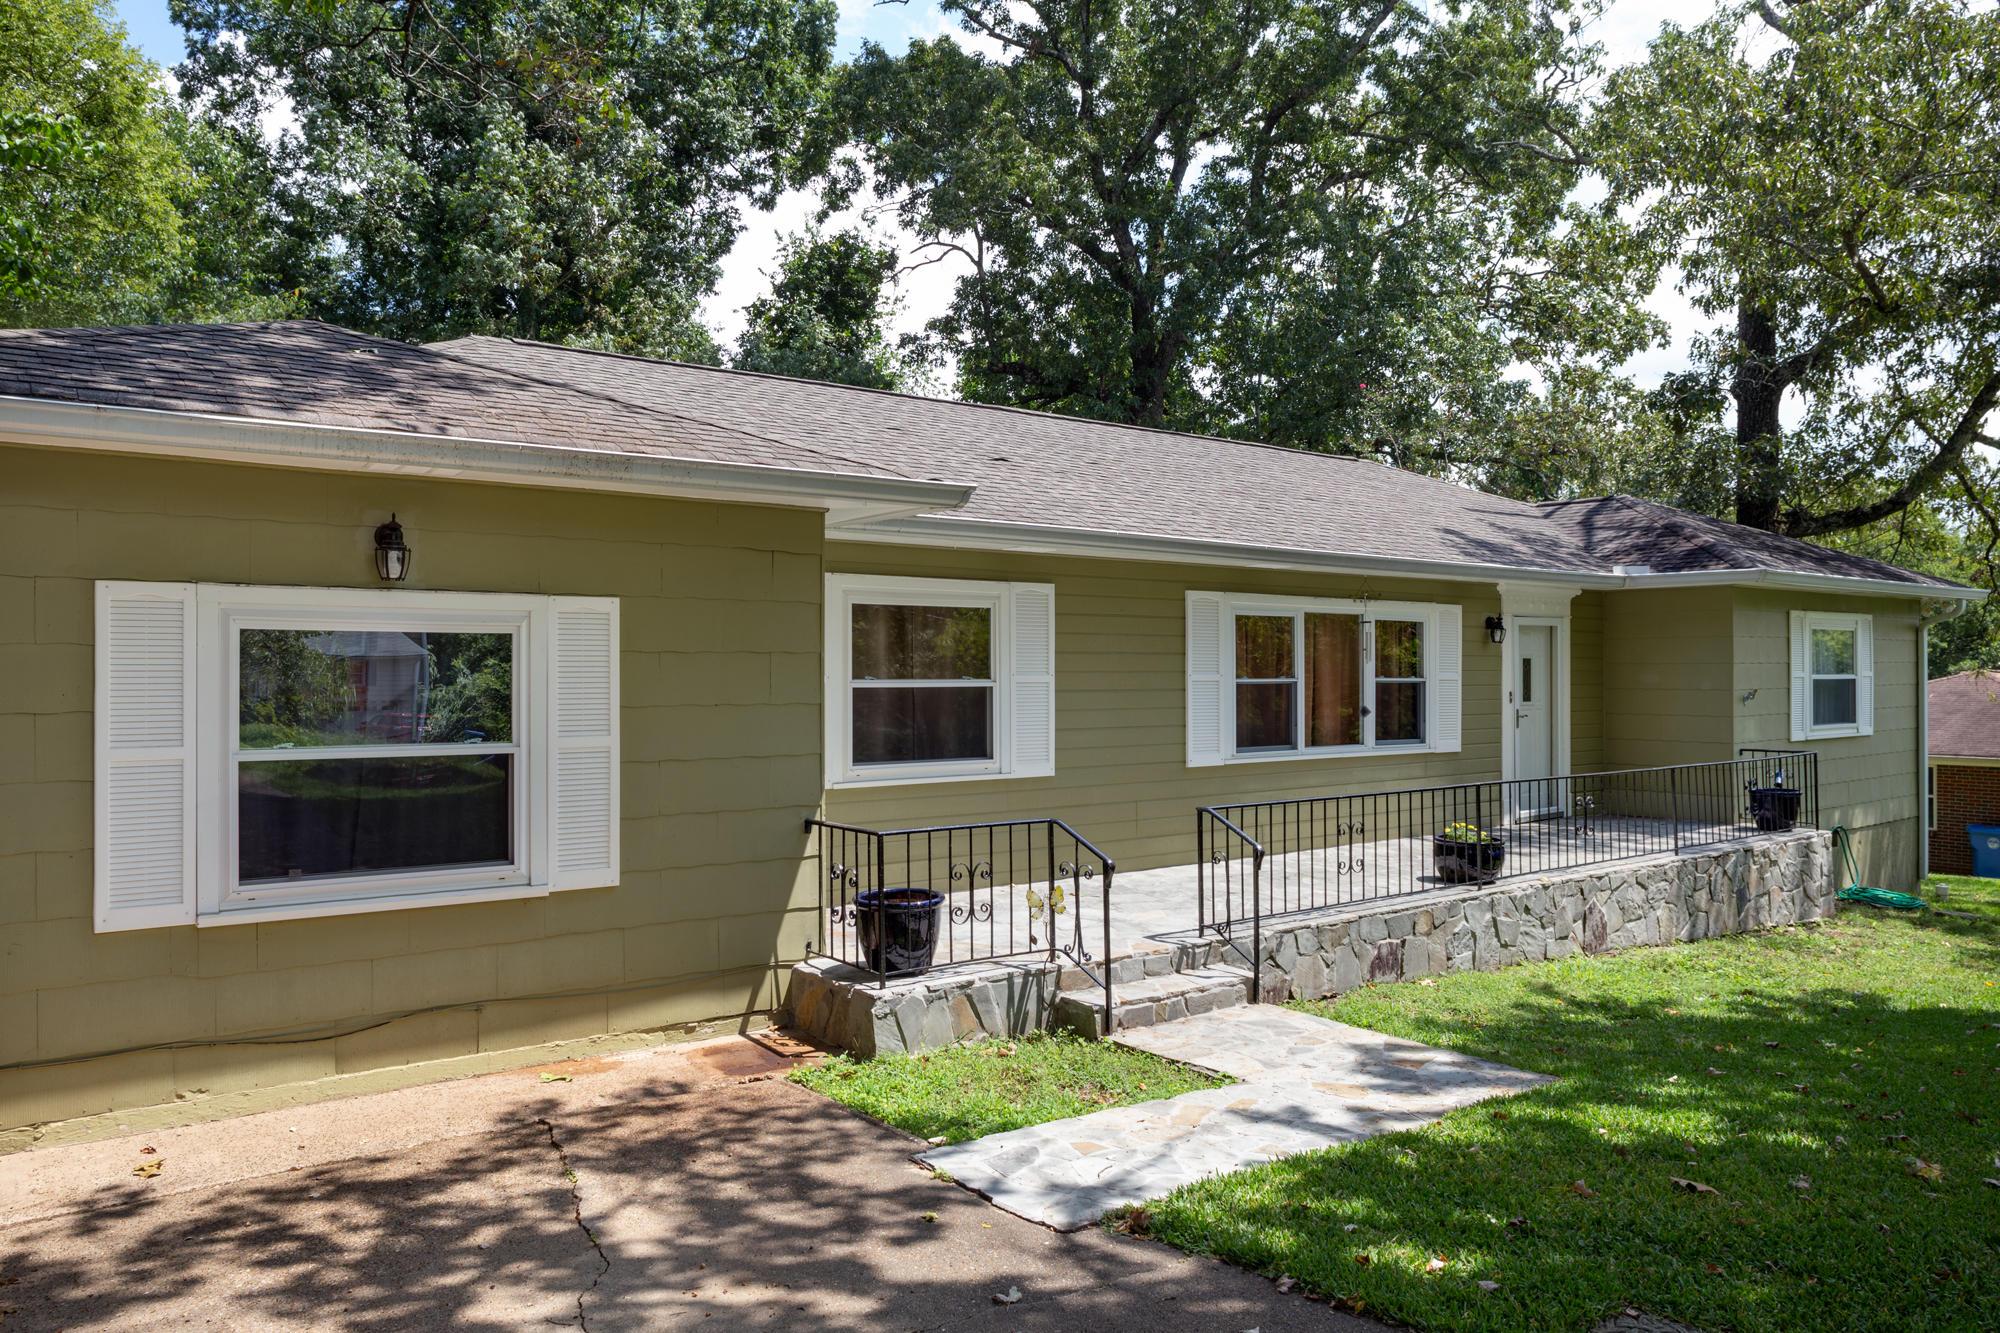 959 Lawson St, Chattanooga, TN 37415